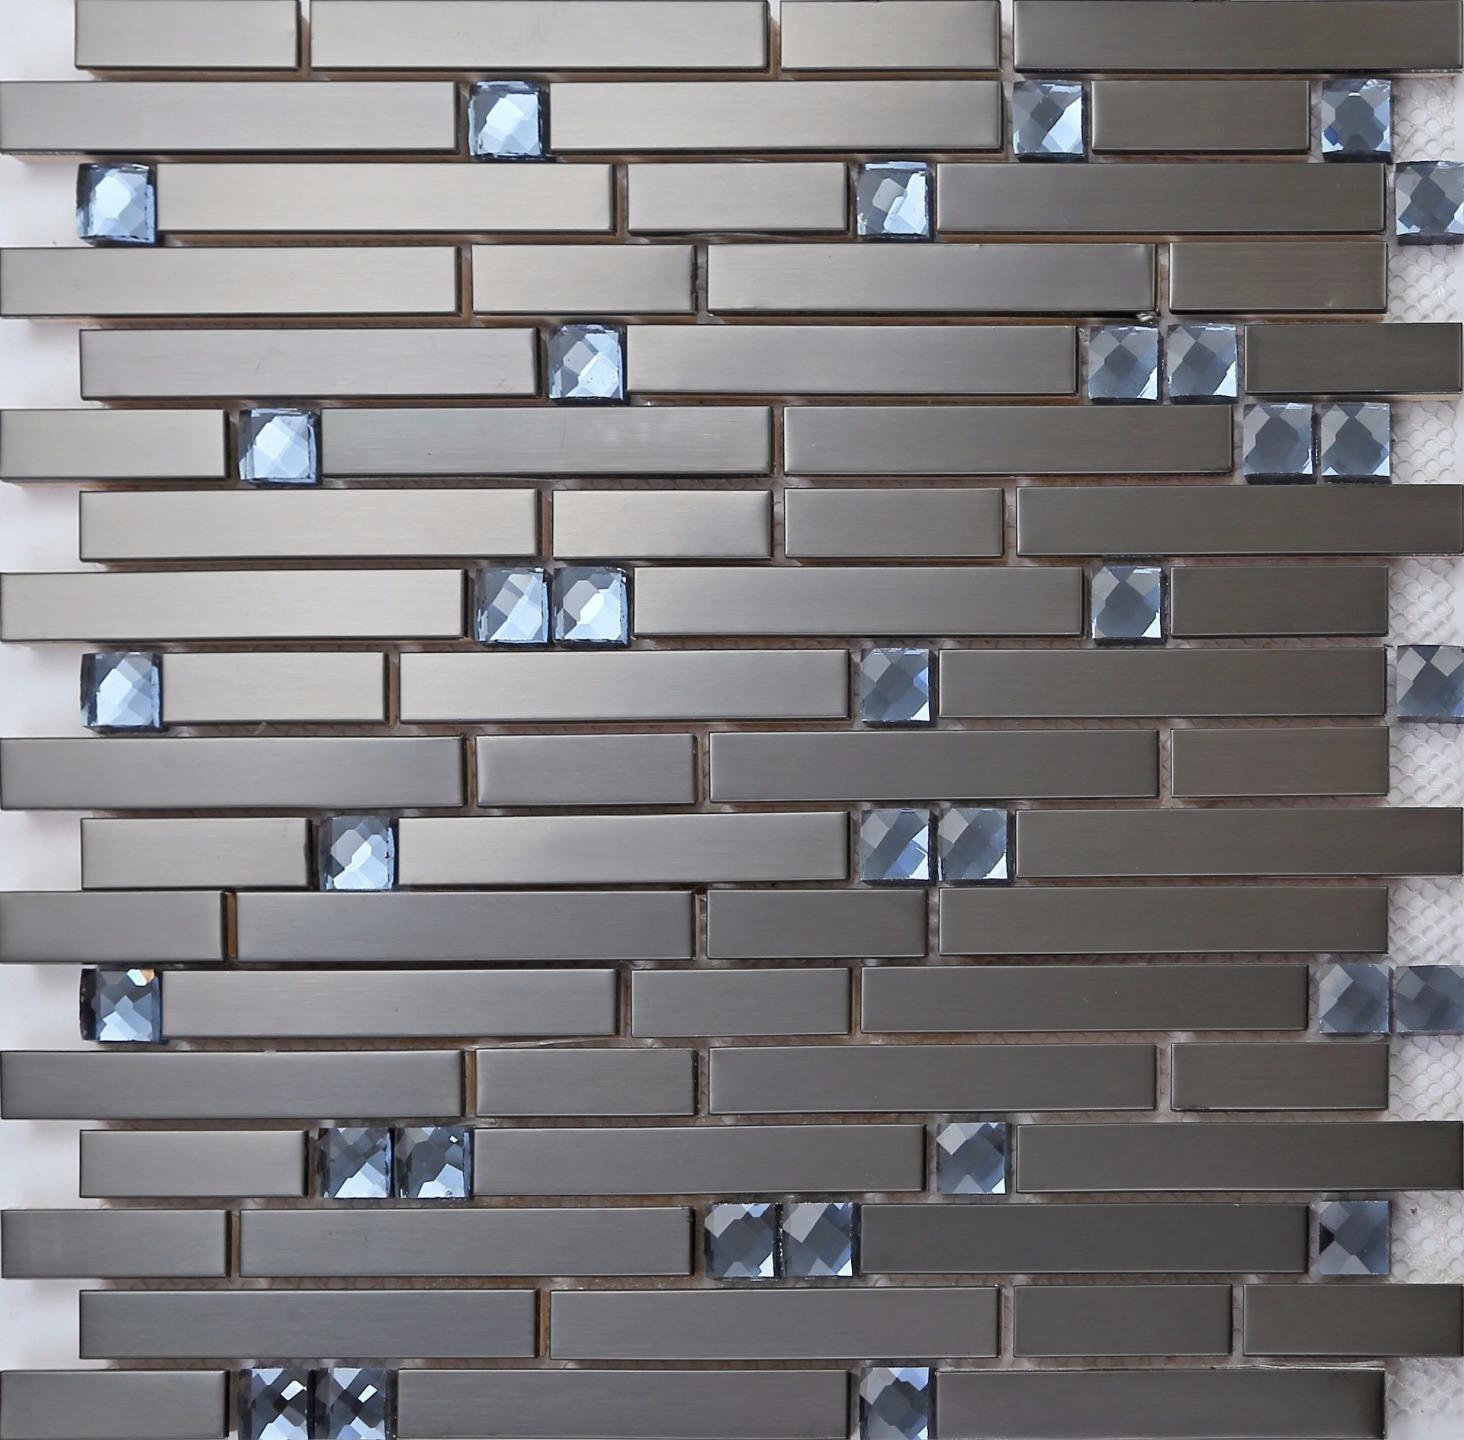 11 Sheets, 1m² Black Stainless Steel and Blue Diamond Glass Brick Shape Mosaic Tiles Sheet (MT0136) 1m² Black Stainless Steel and Blue Diamond Glass Brick Shape Mosaic Tiles Sheet (MT0136) Grand Taps